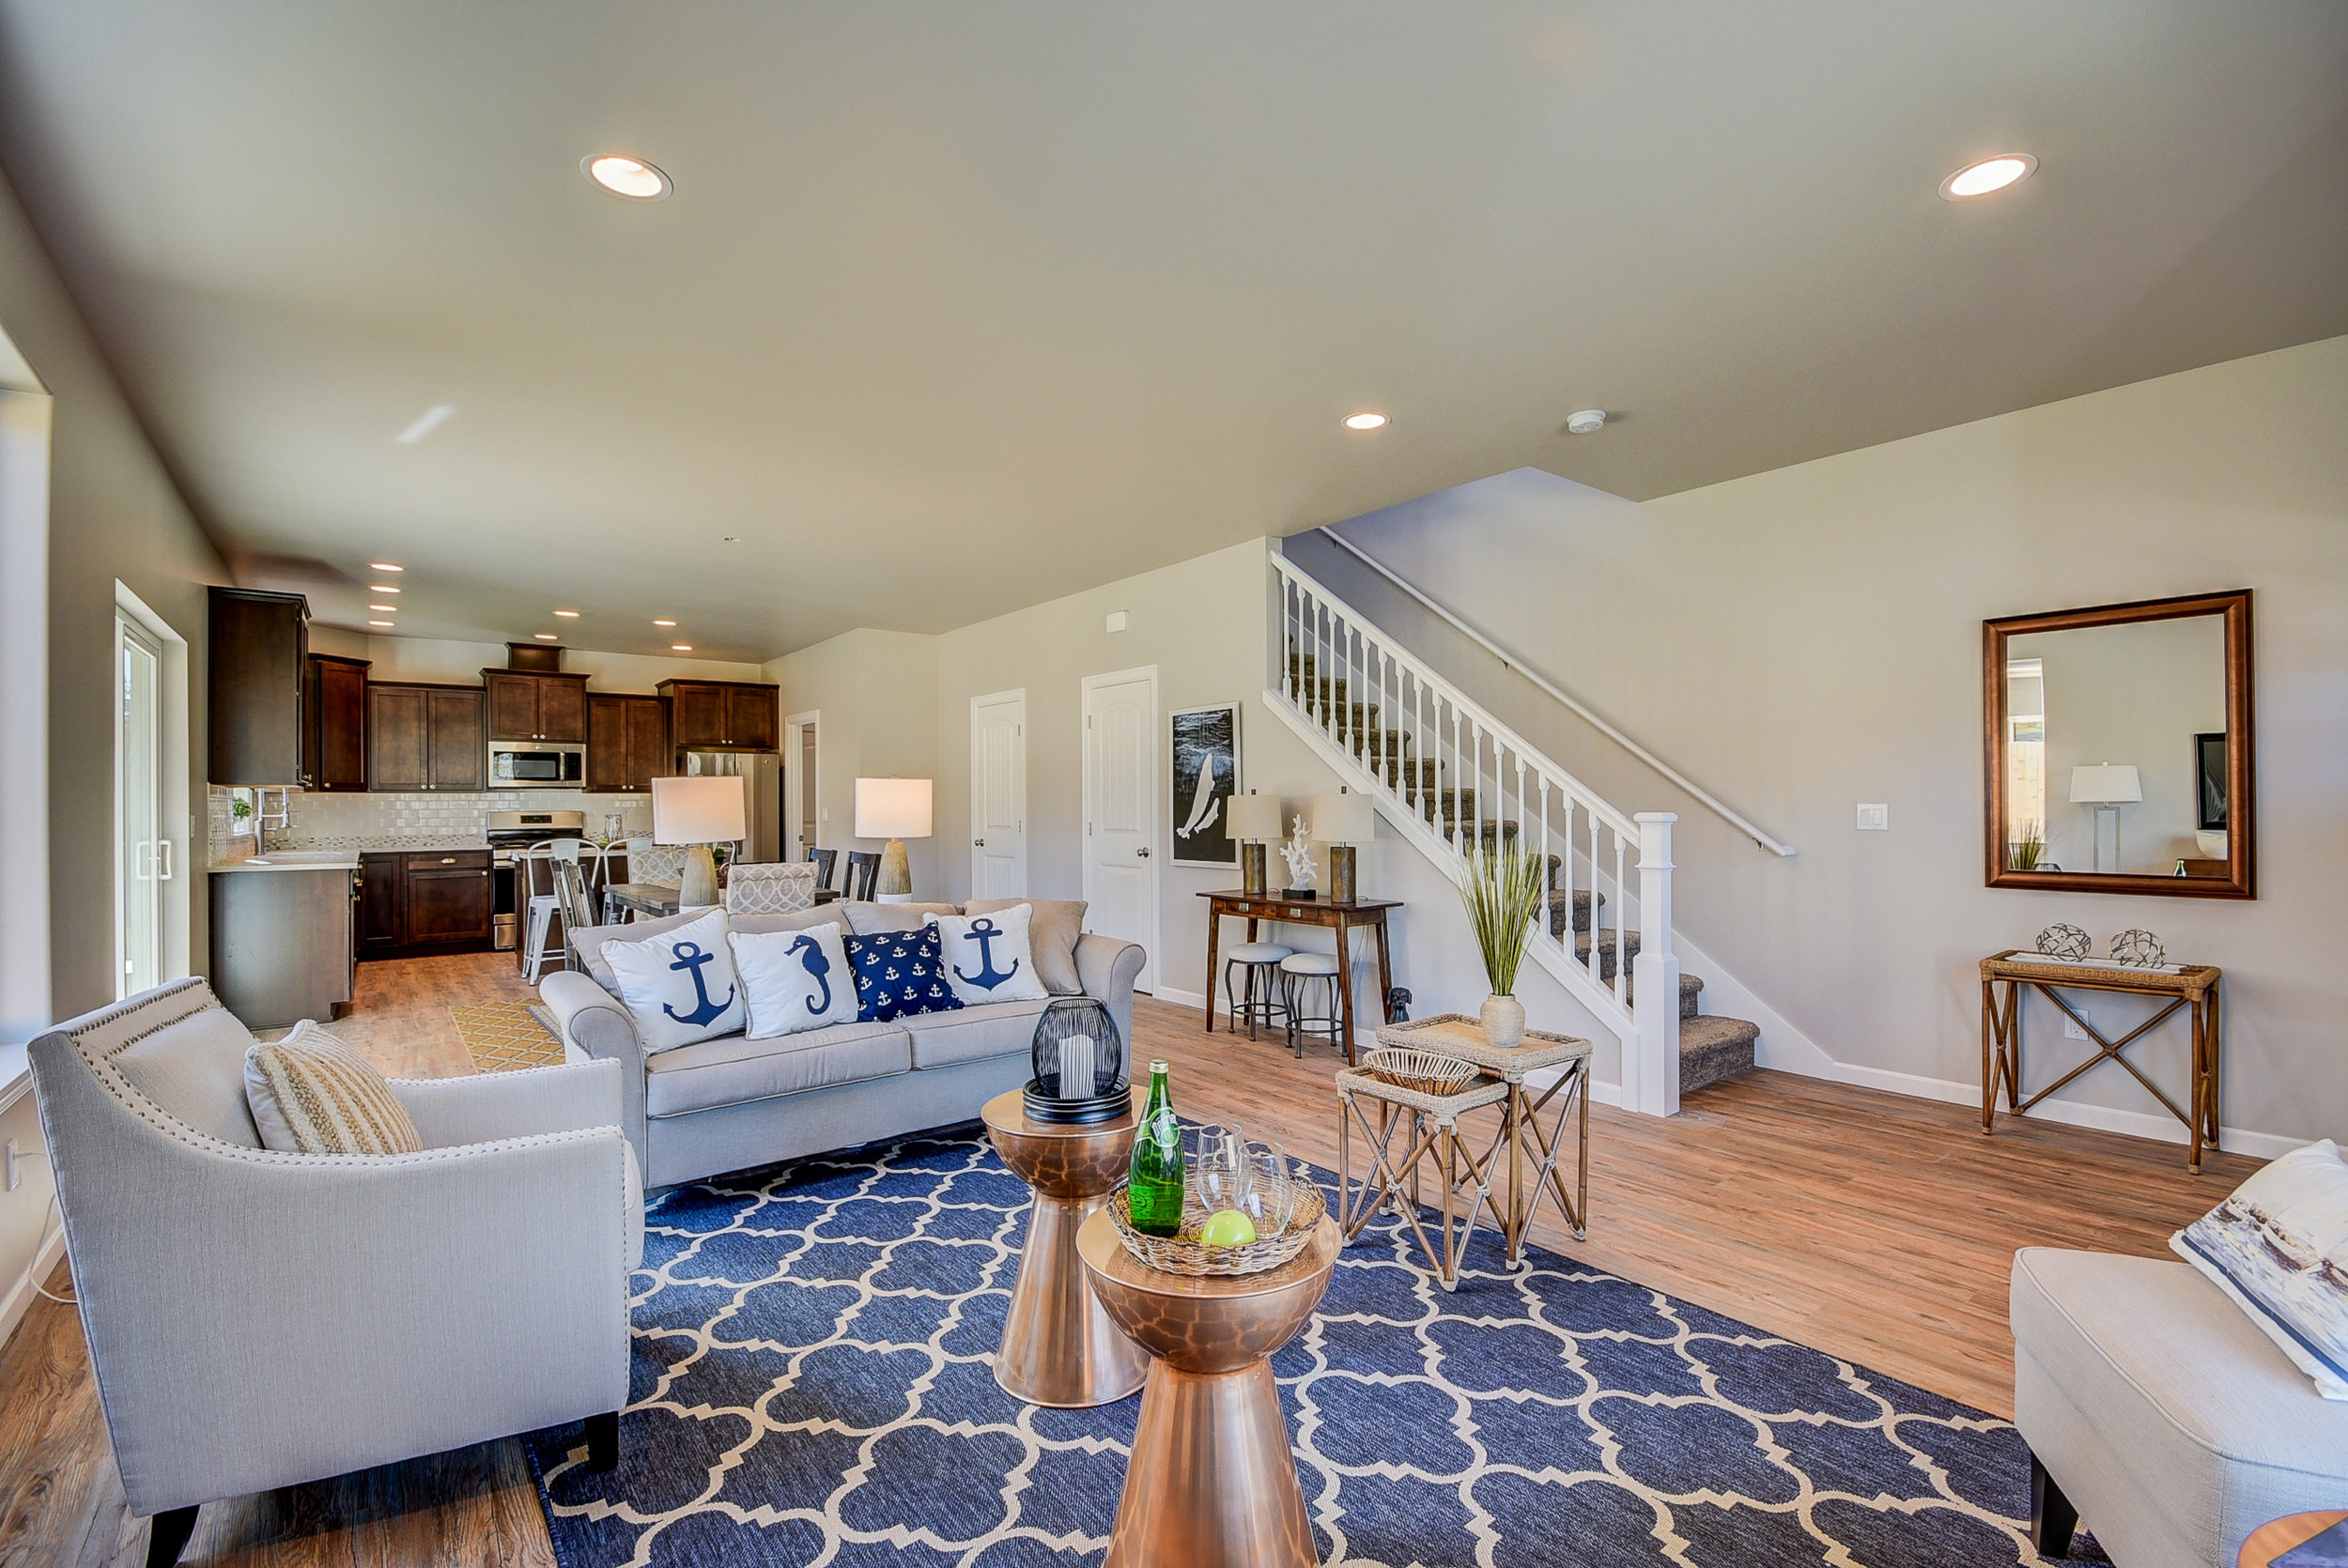 Gorgeous & durable vinyl flooring on the main level....